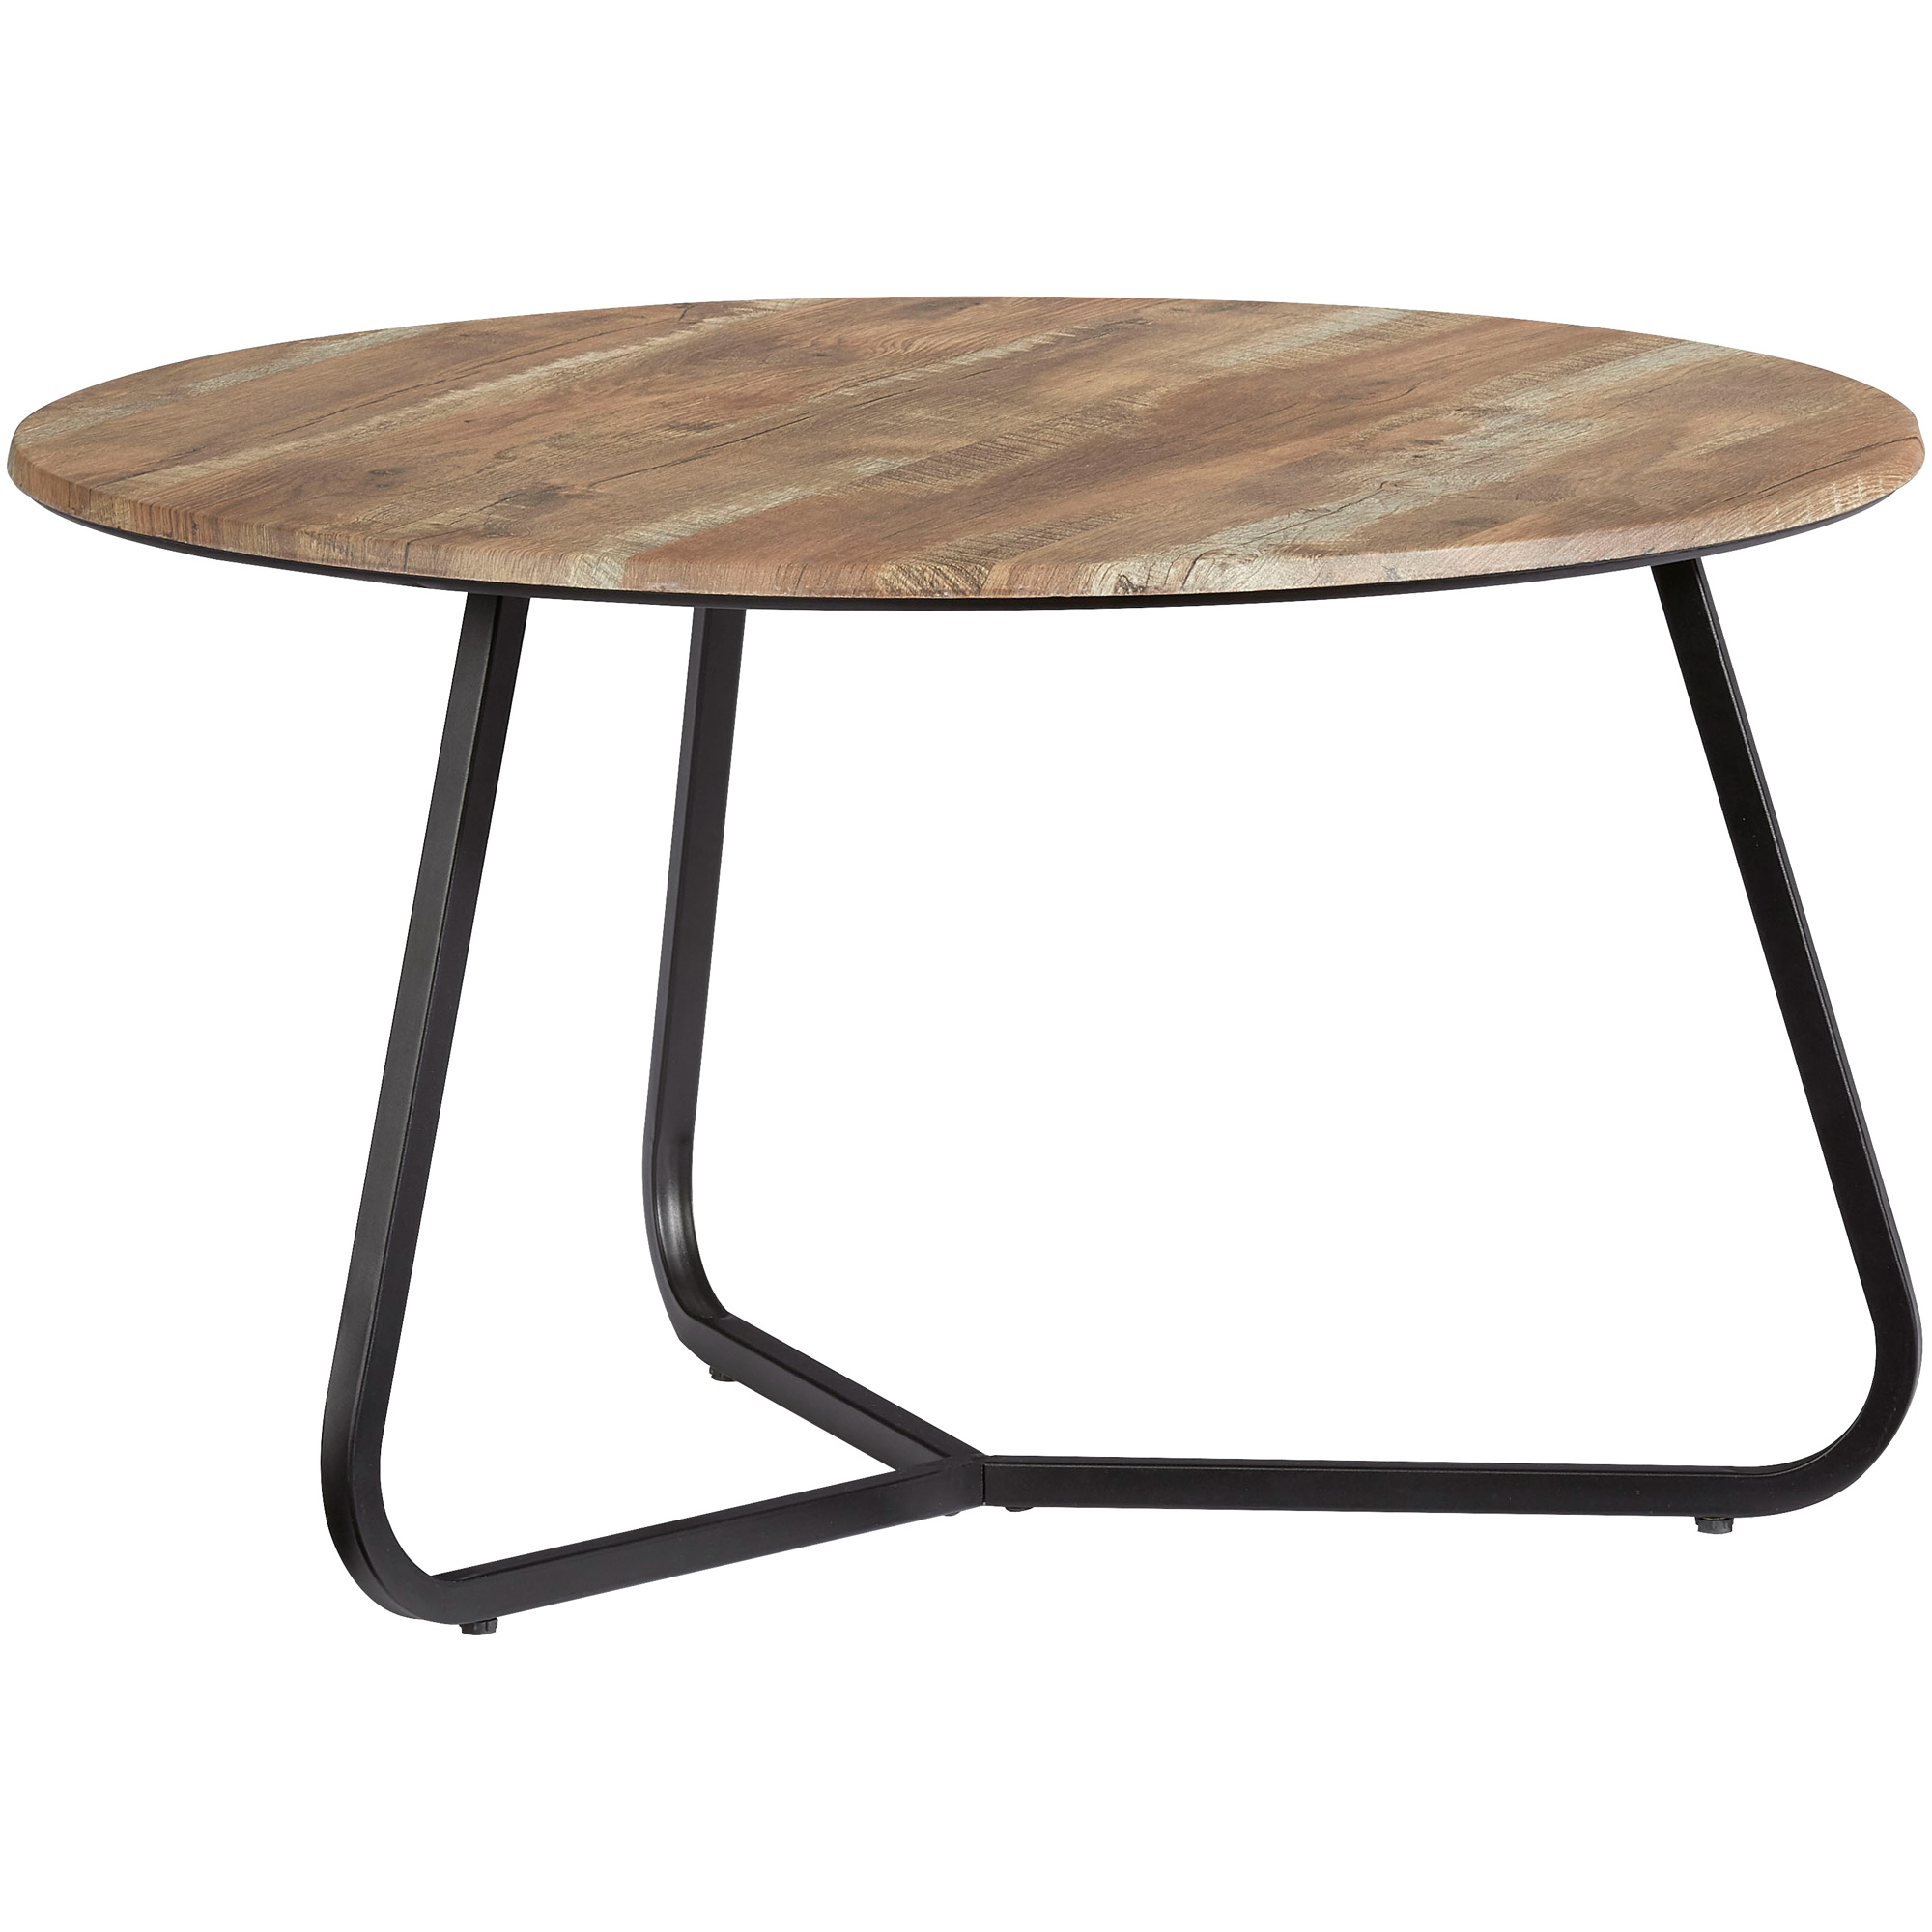 Progressive | Finley Yukon Coffee Table | Black